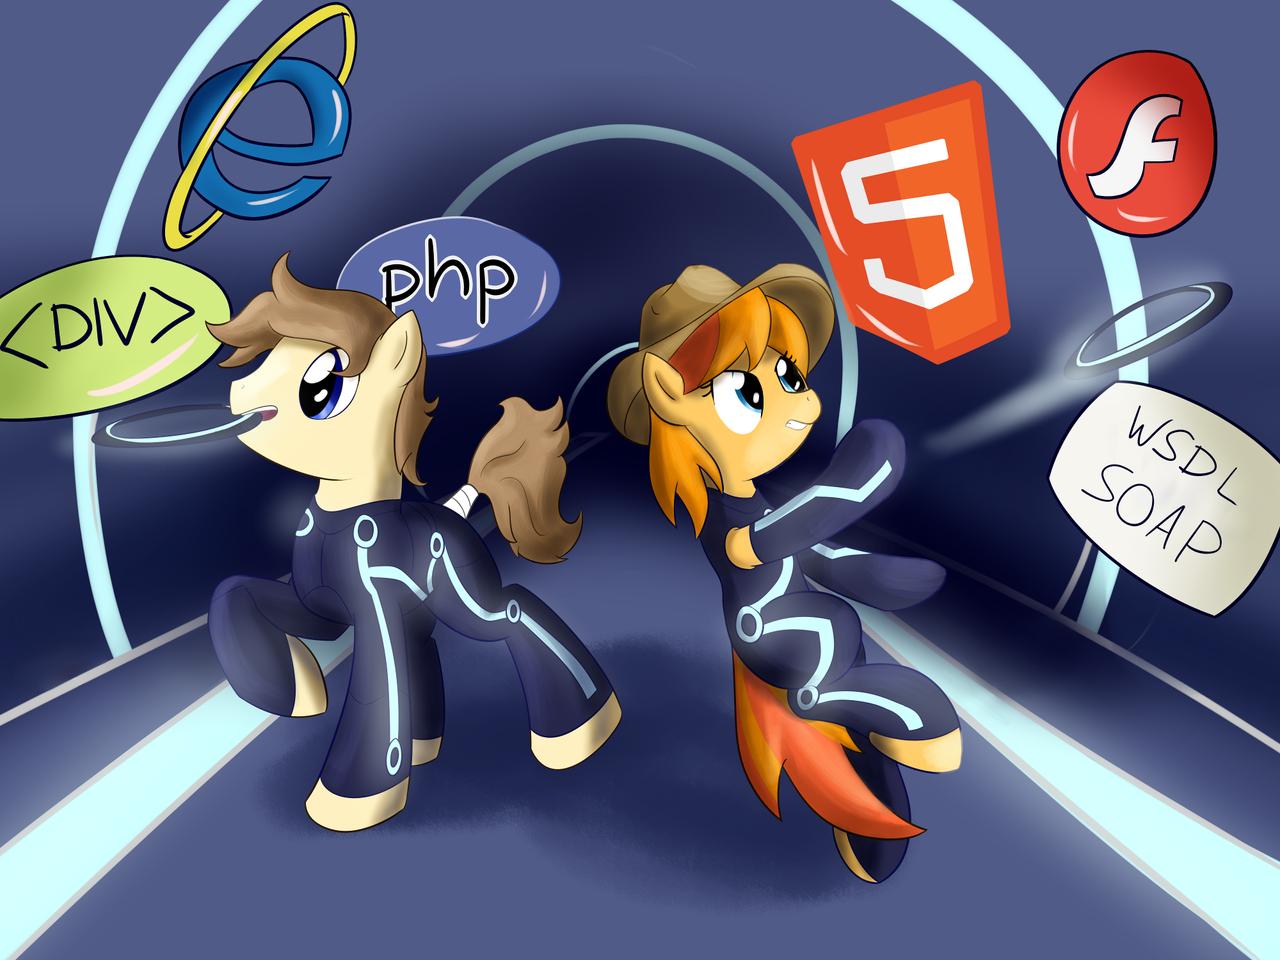 Web Development by Whatsapokemon